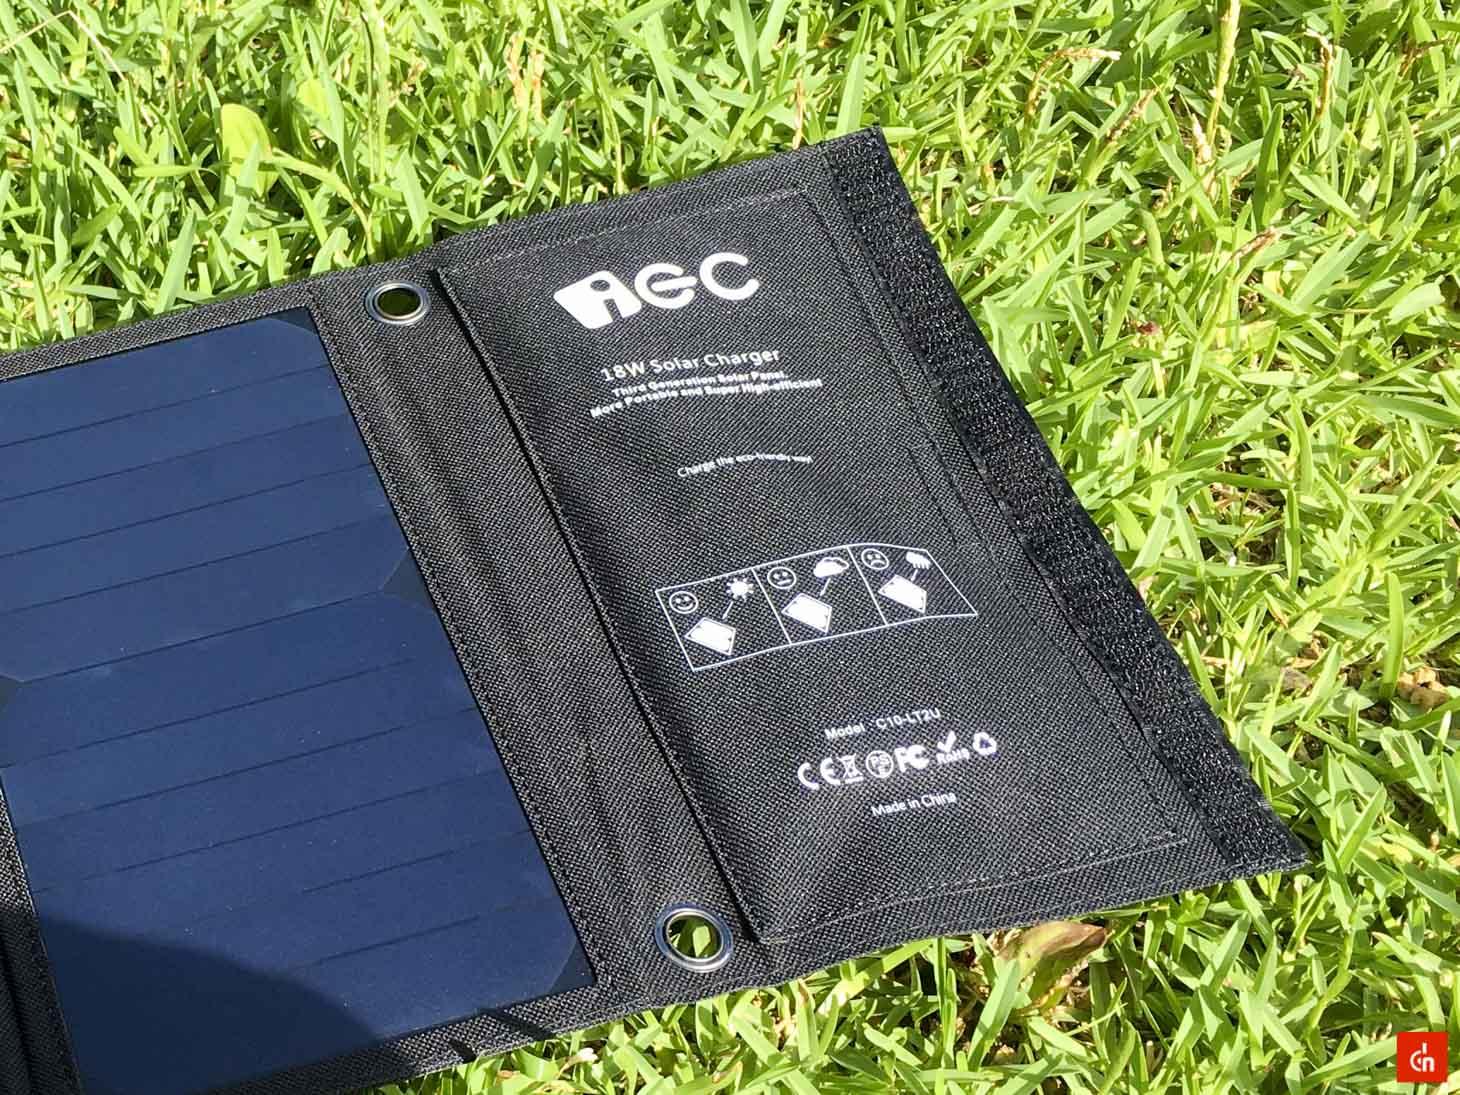 024_20160618_iec-solar-charger